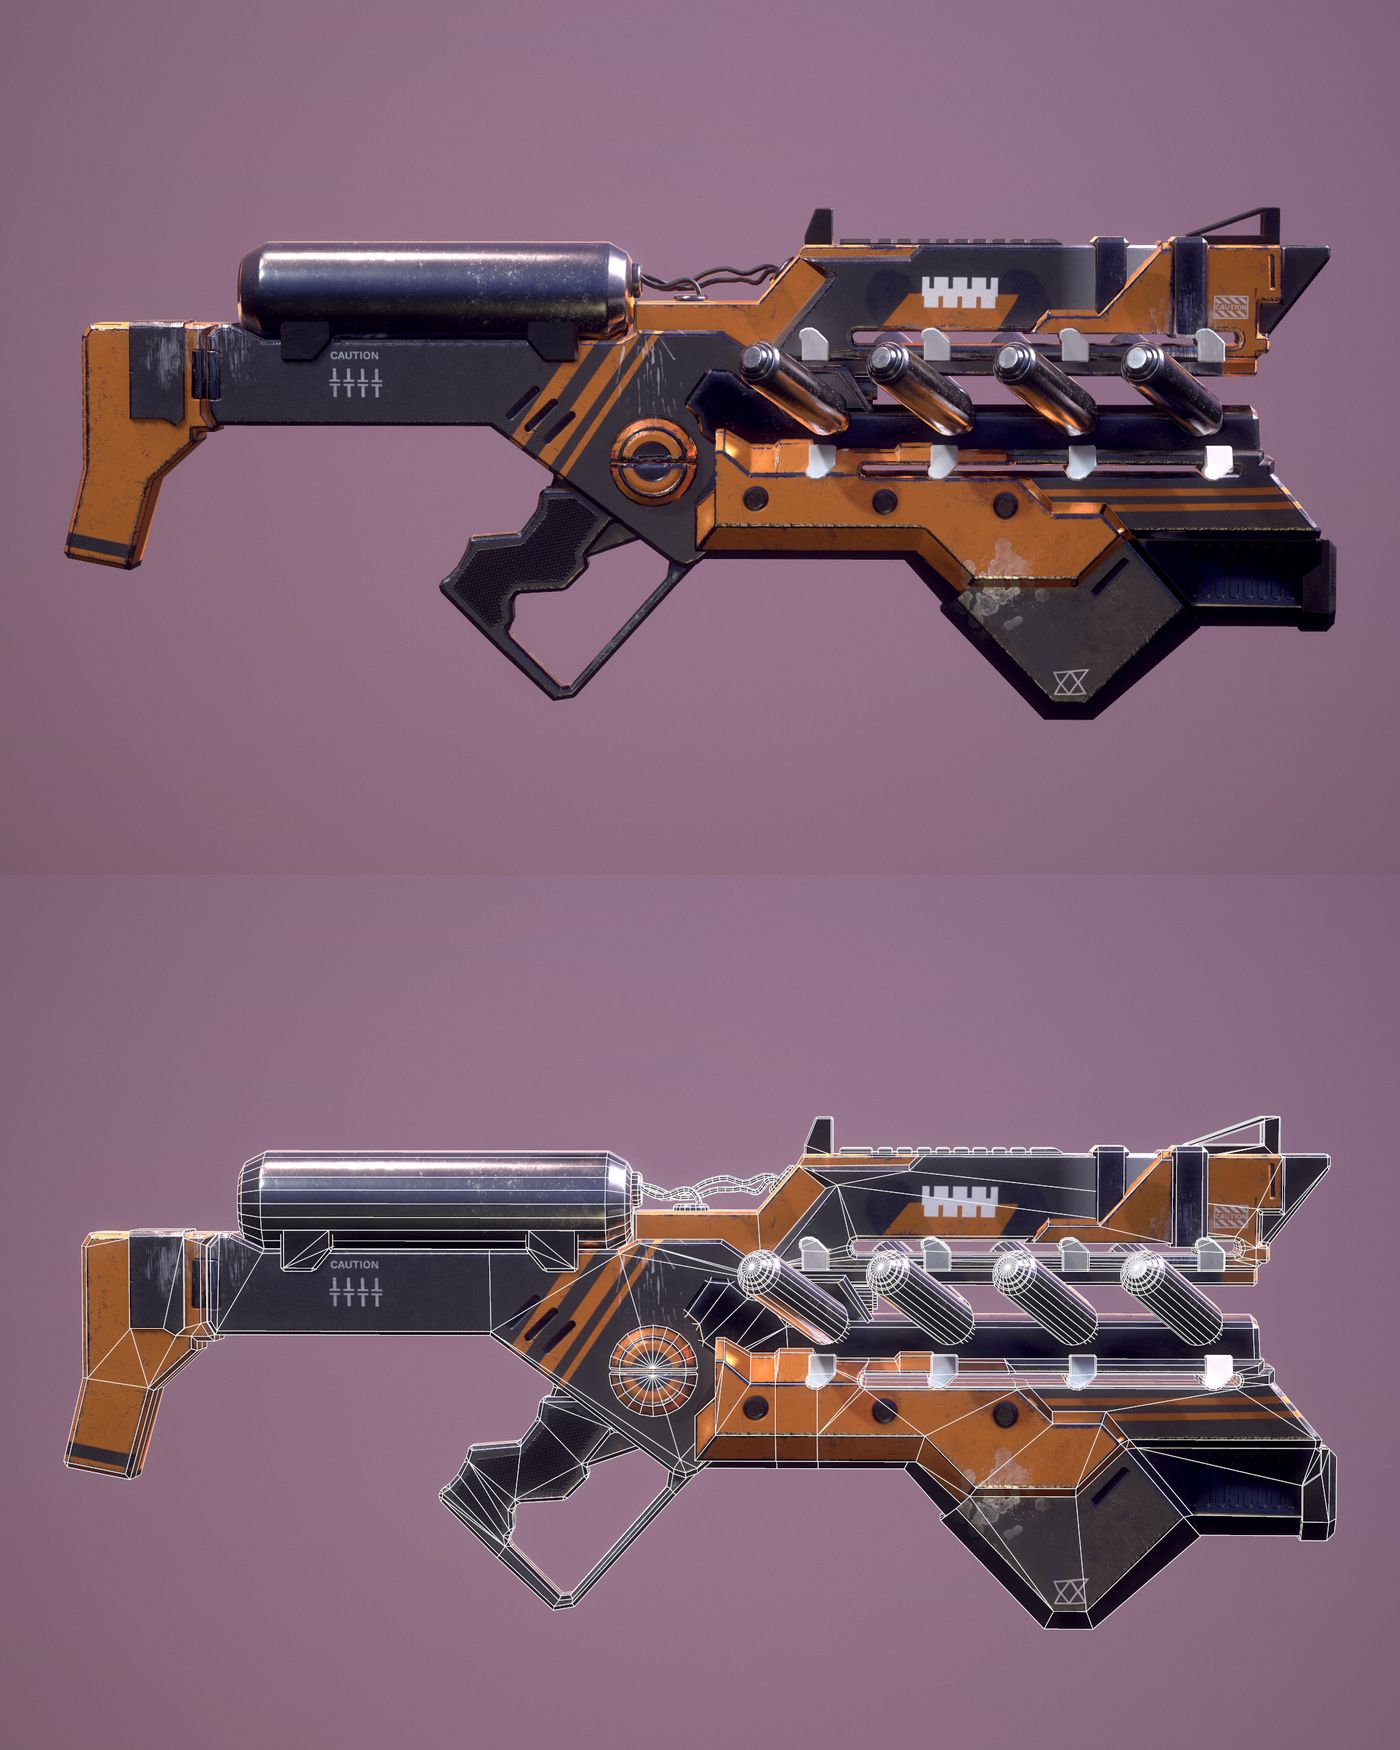 Cyborg Weapon Marleenvijgen